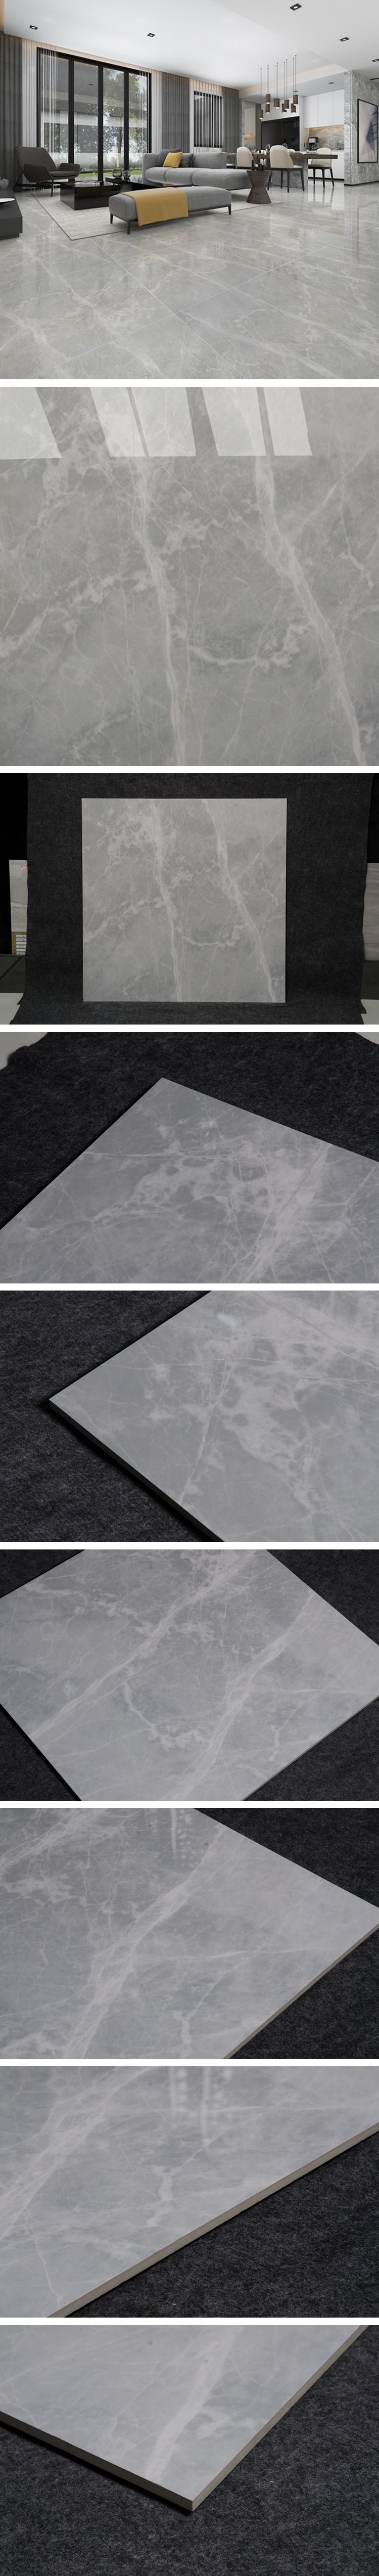 Piso de cerâmica 450x450 telha de pedra cinza piso de mármore italiano